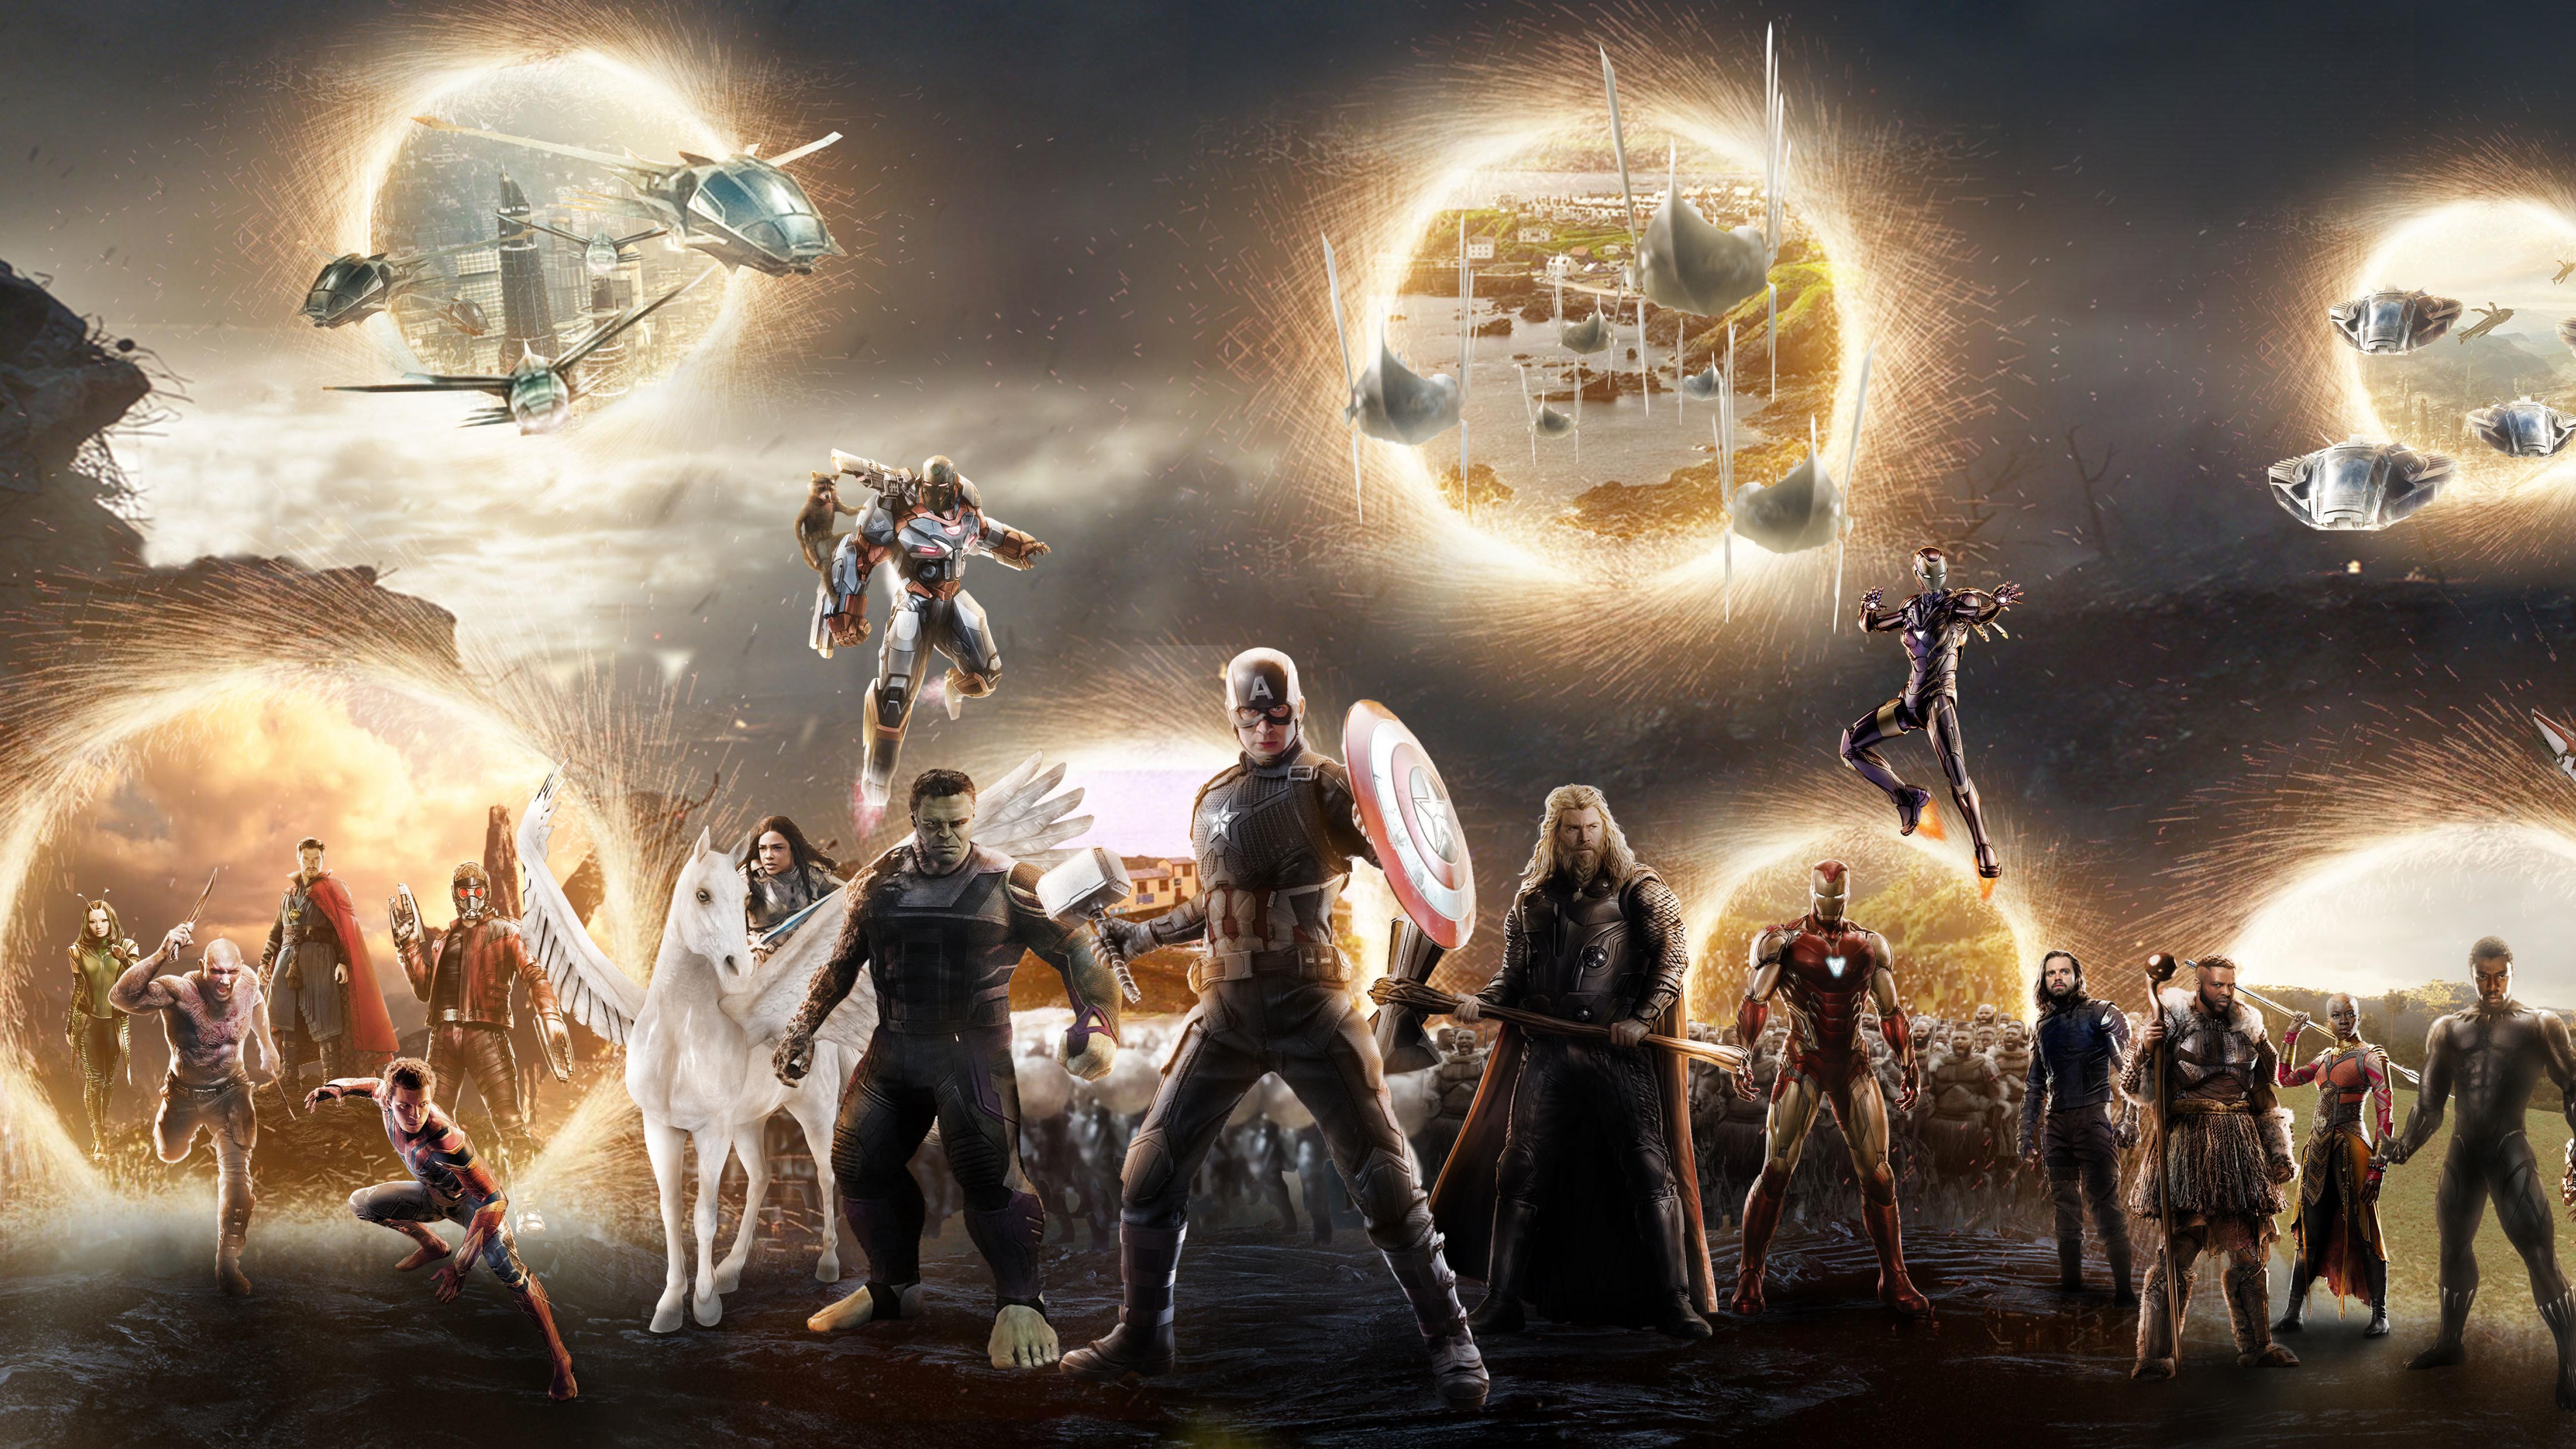 5120x2880 Avengers Assemble 5K Wallpaper, HD Movies 4K ...